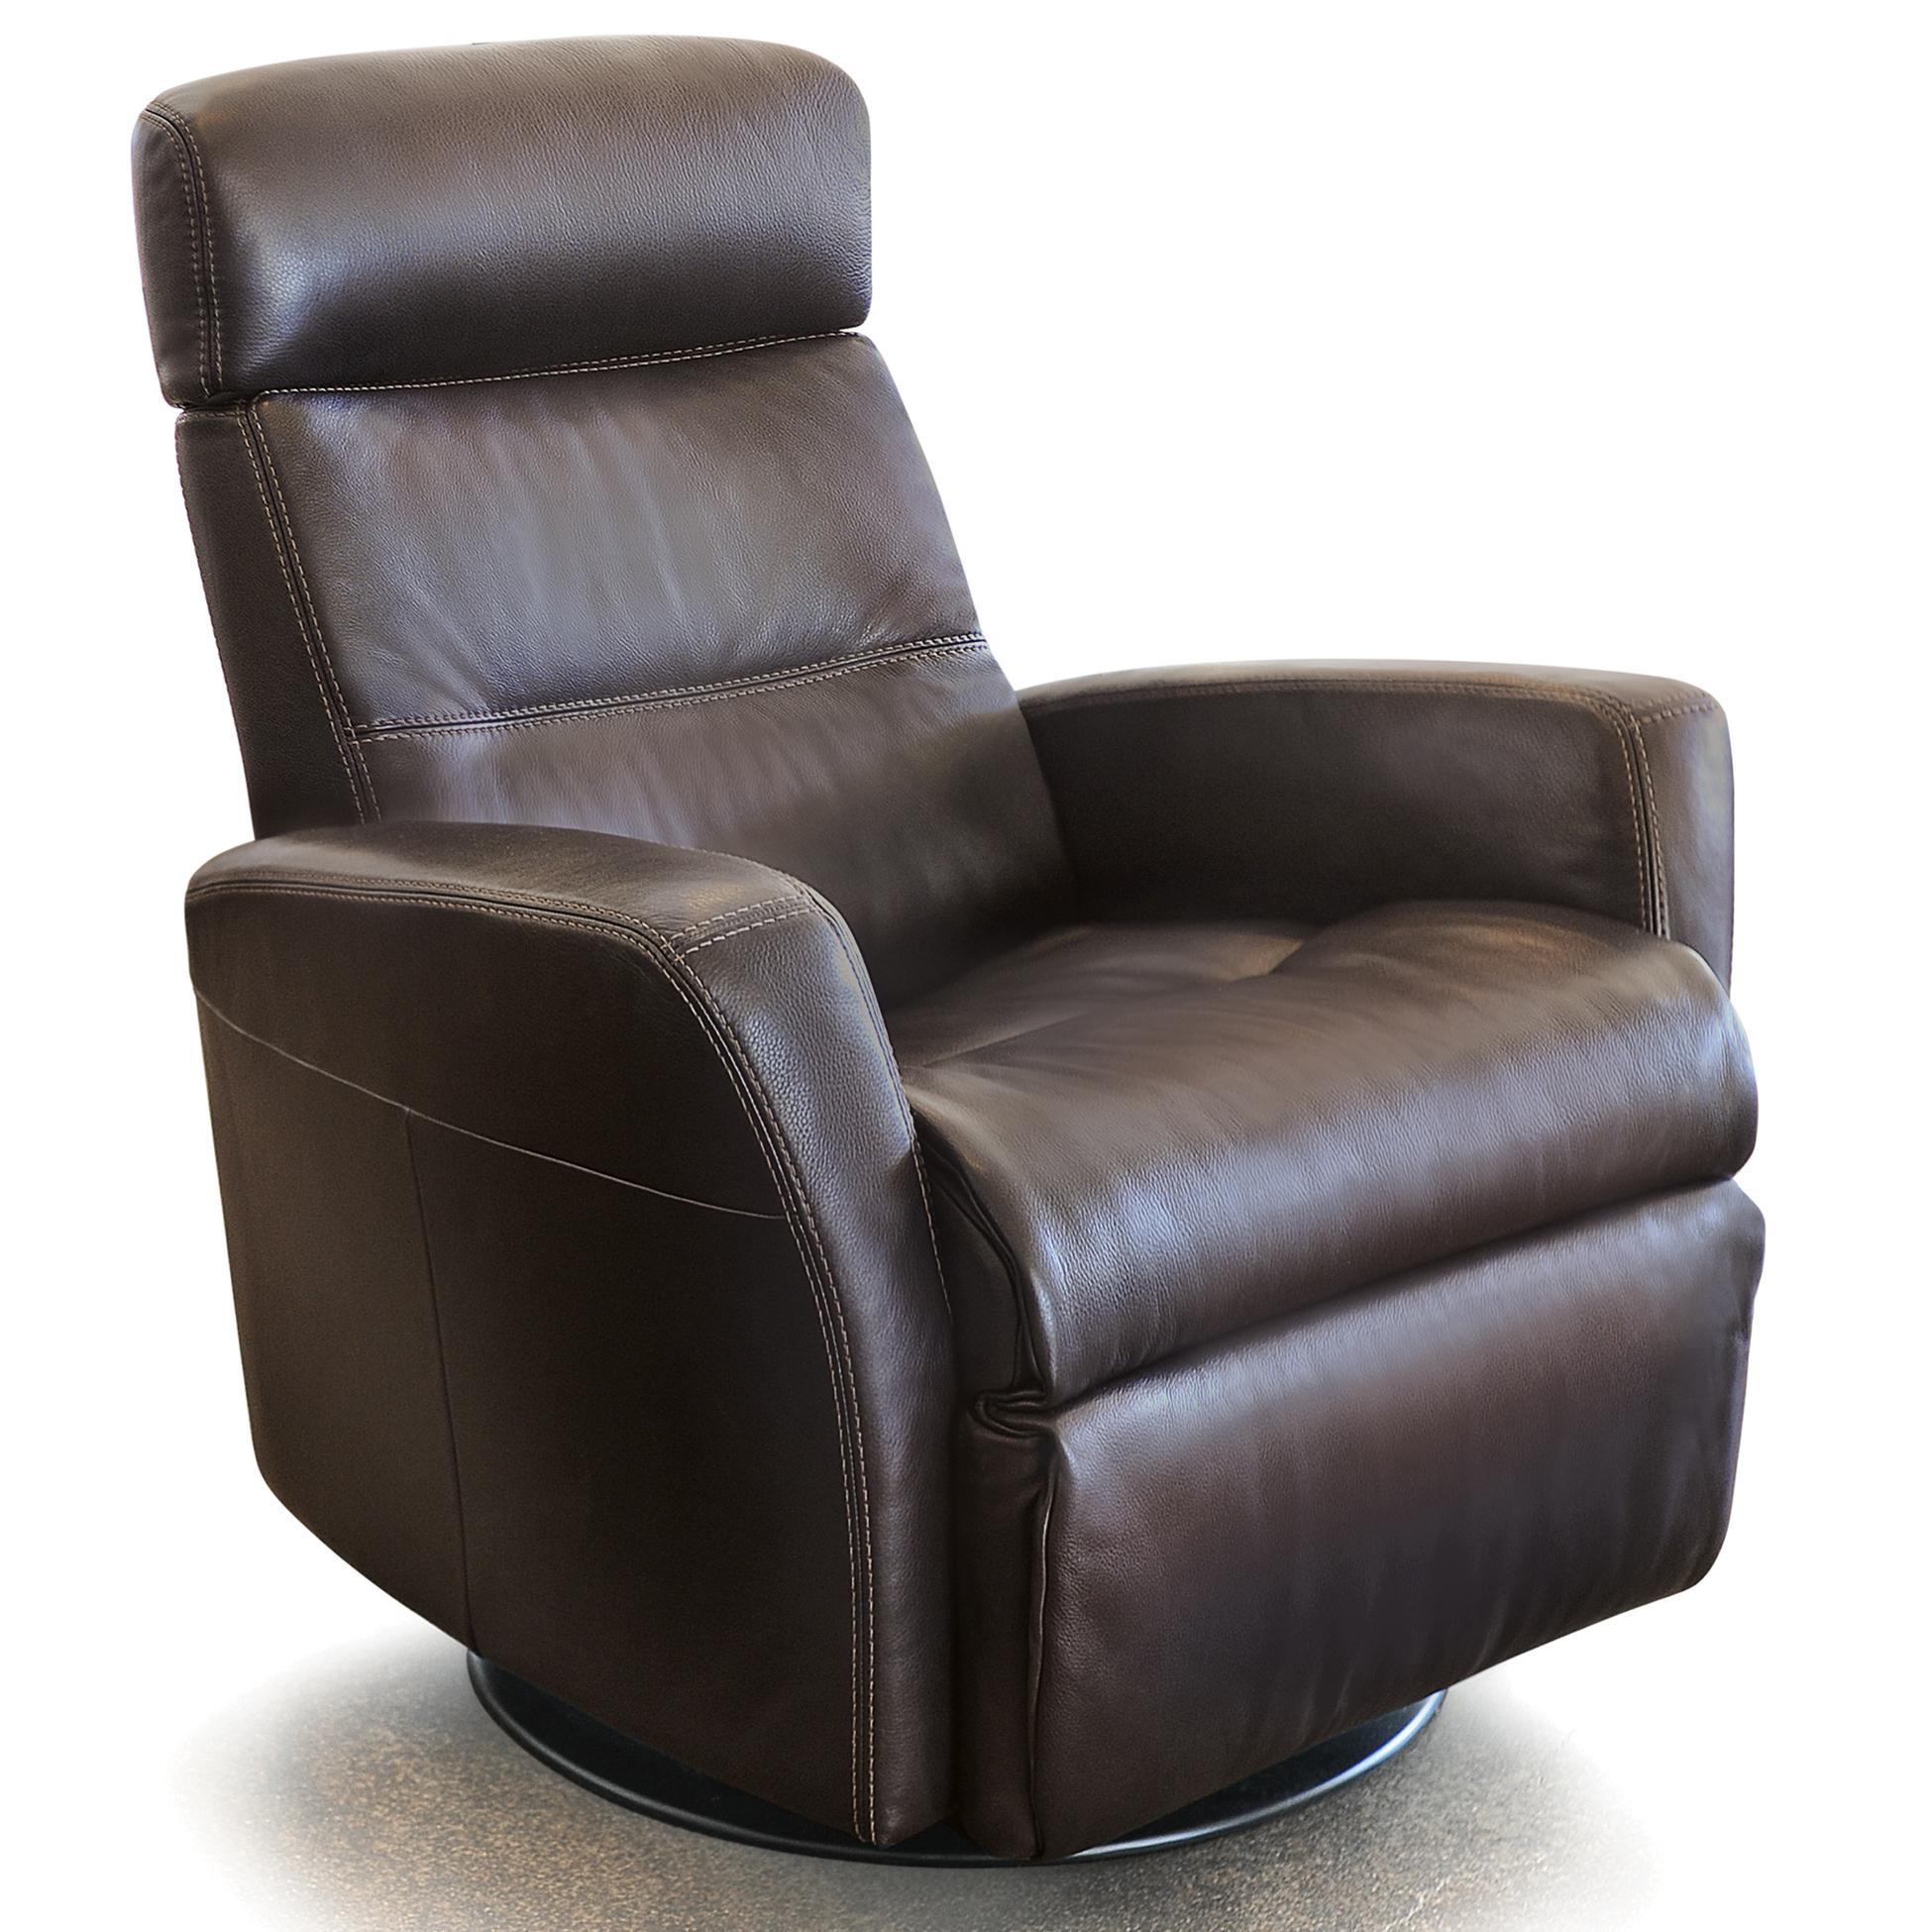 Vendor 508 Recliners Recliner Relaxer - Item Number: 0154267SO